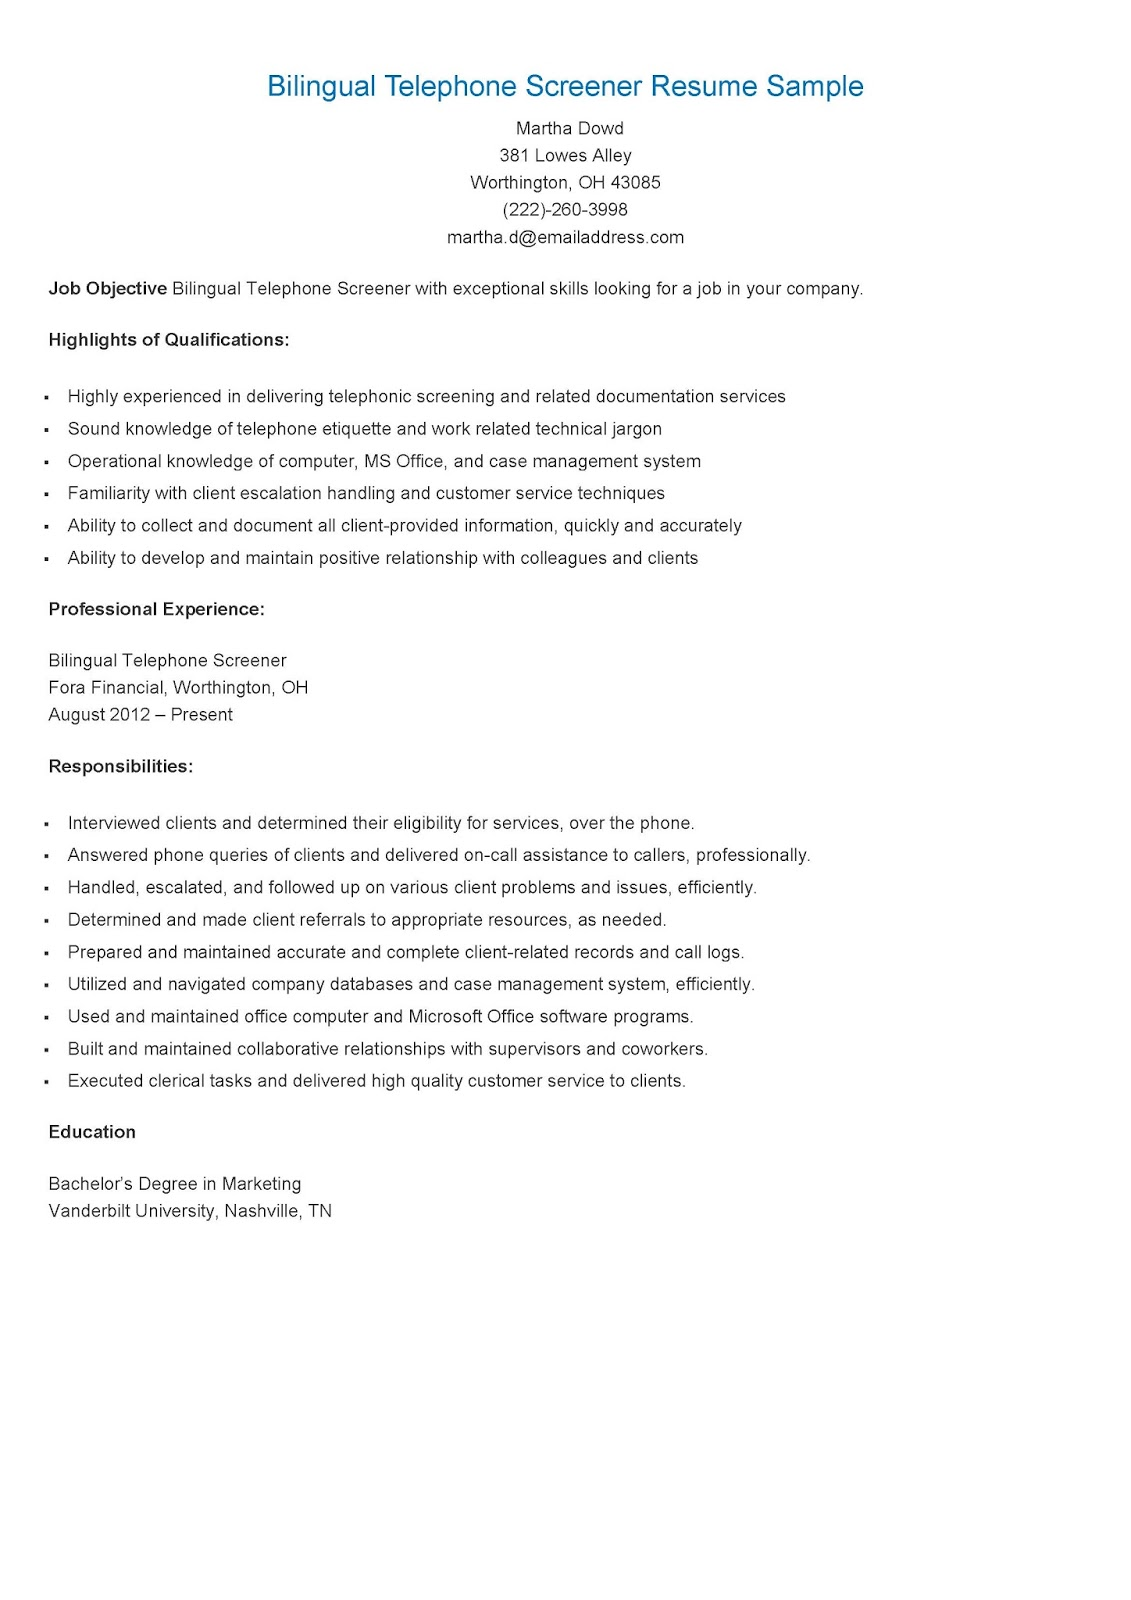 resume sles bilingual telephone screener resume sle